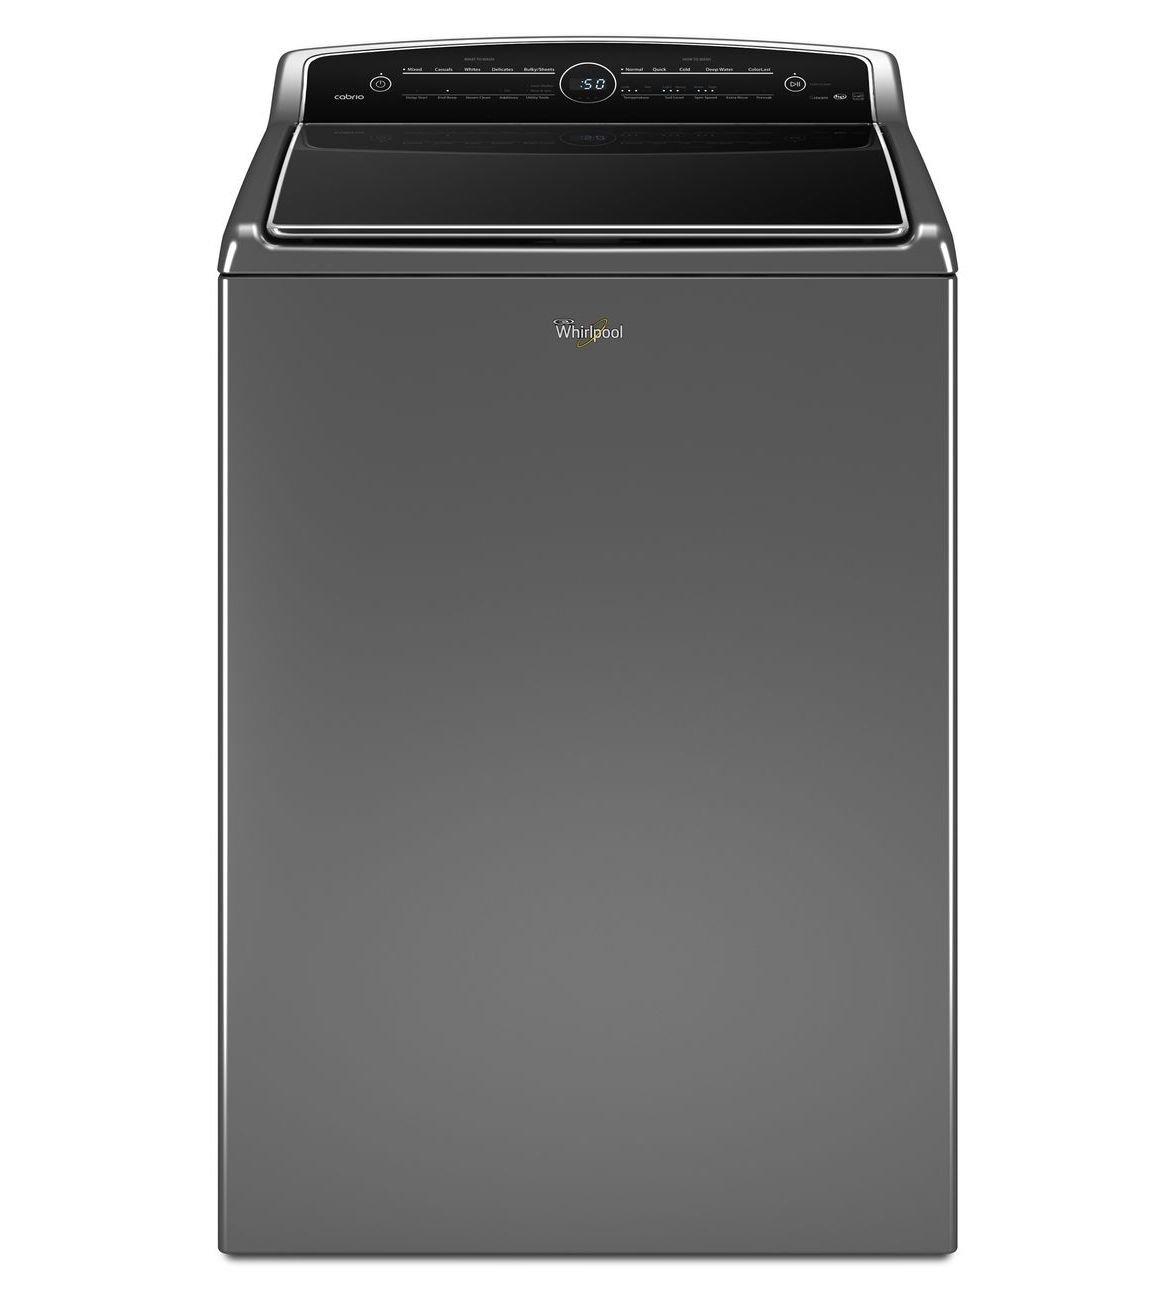 Whirlpool WTW8500DC lavadora - Lavadora-secadora: Amazon.es ...